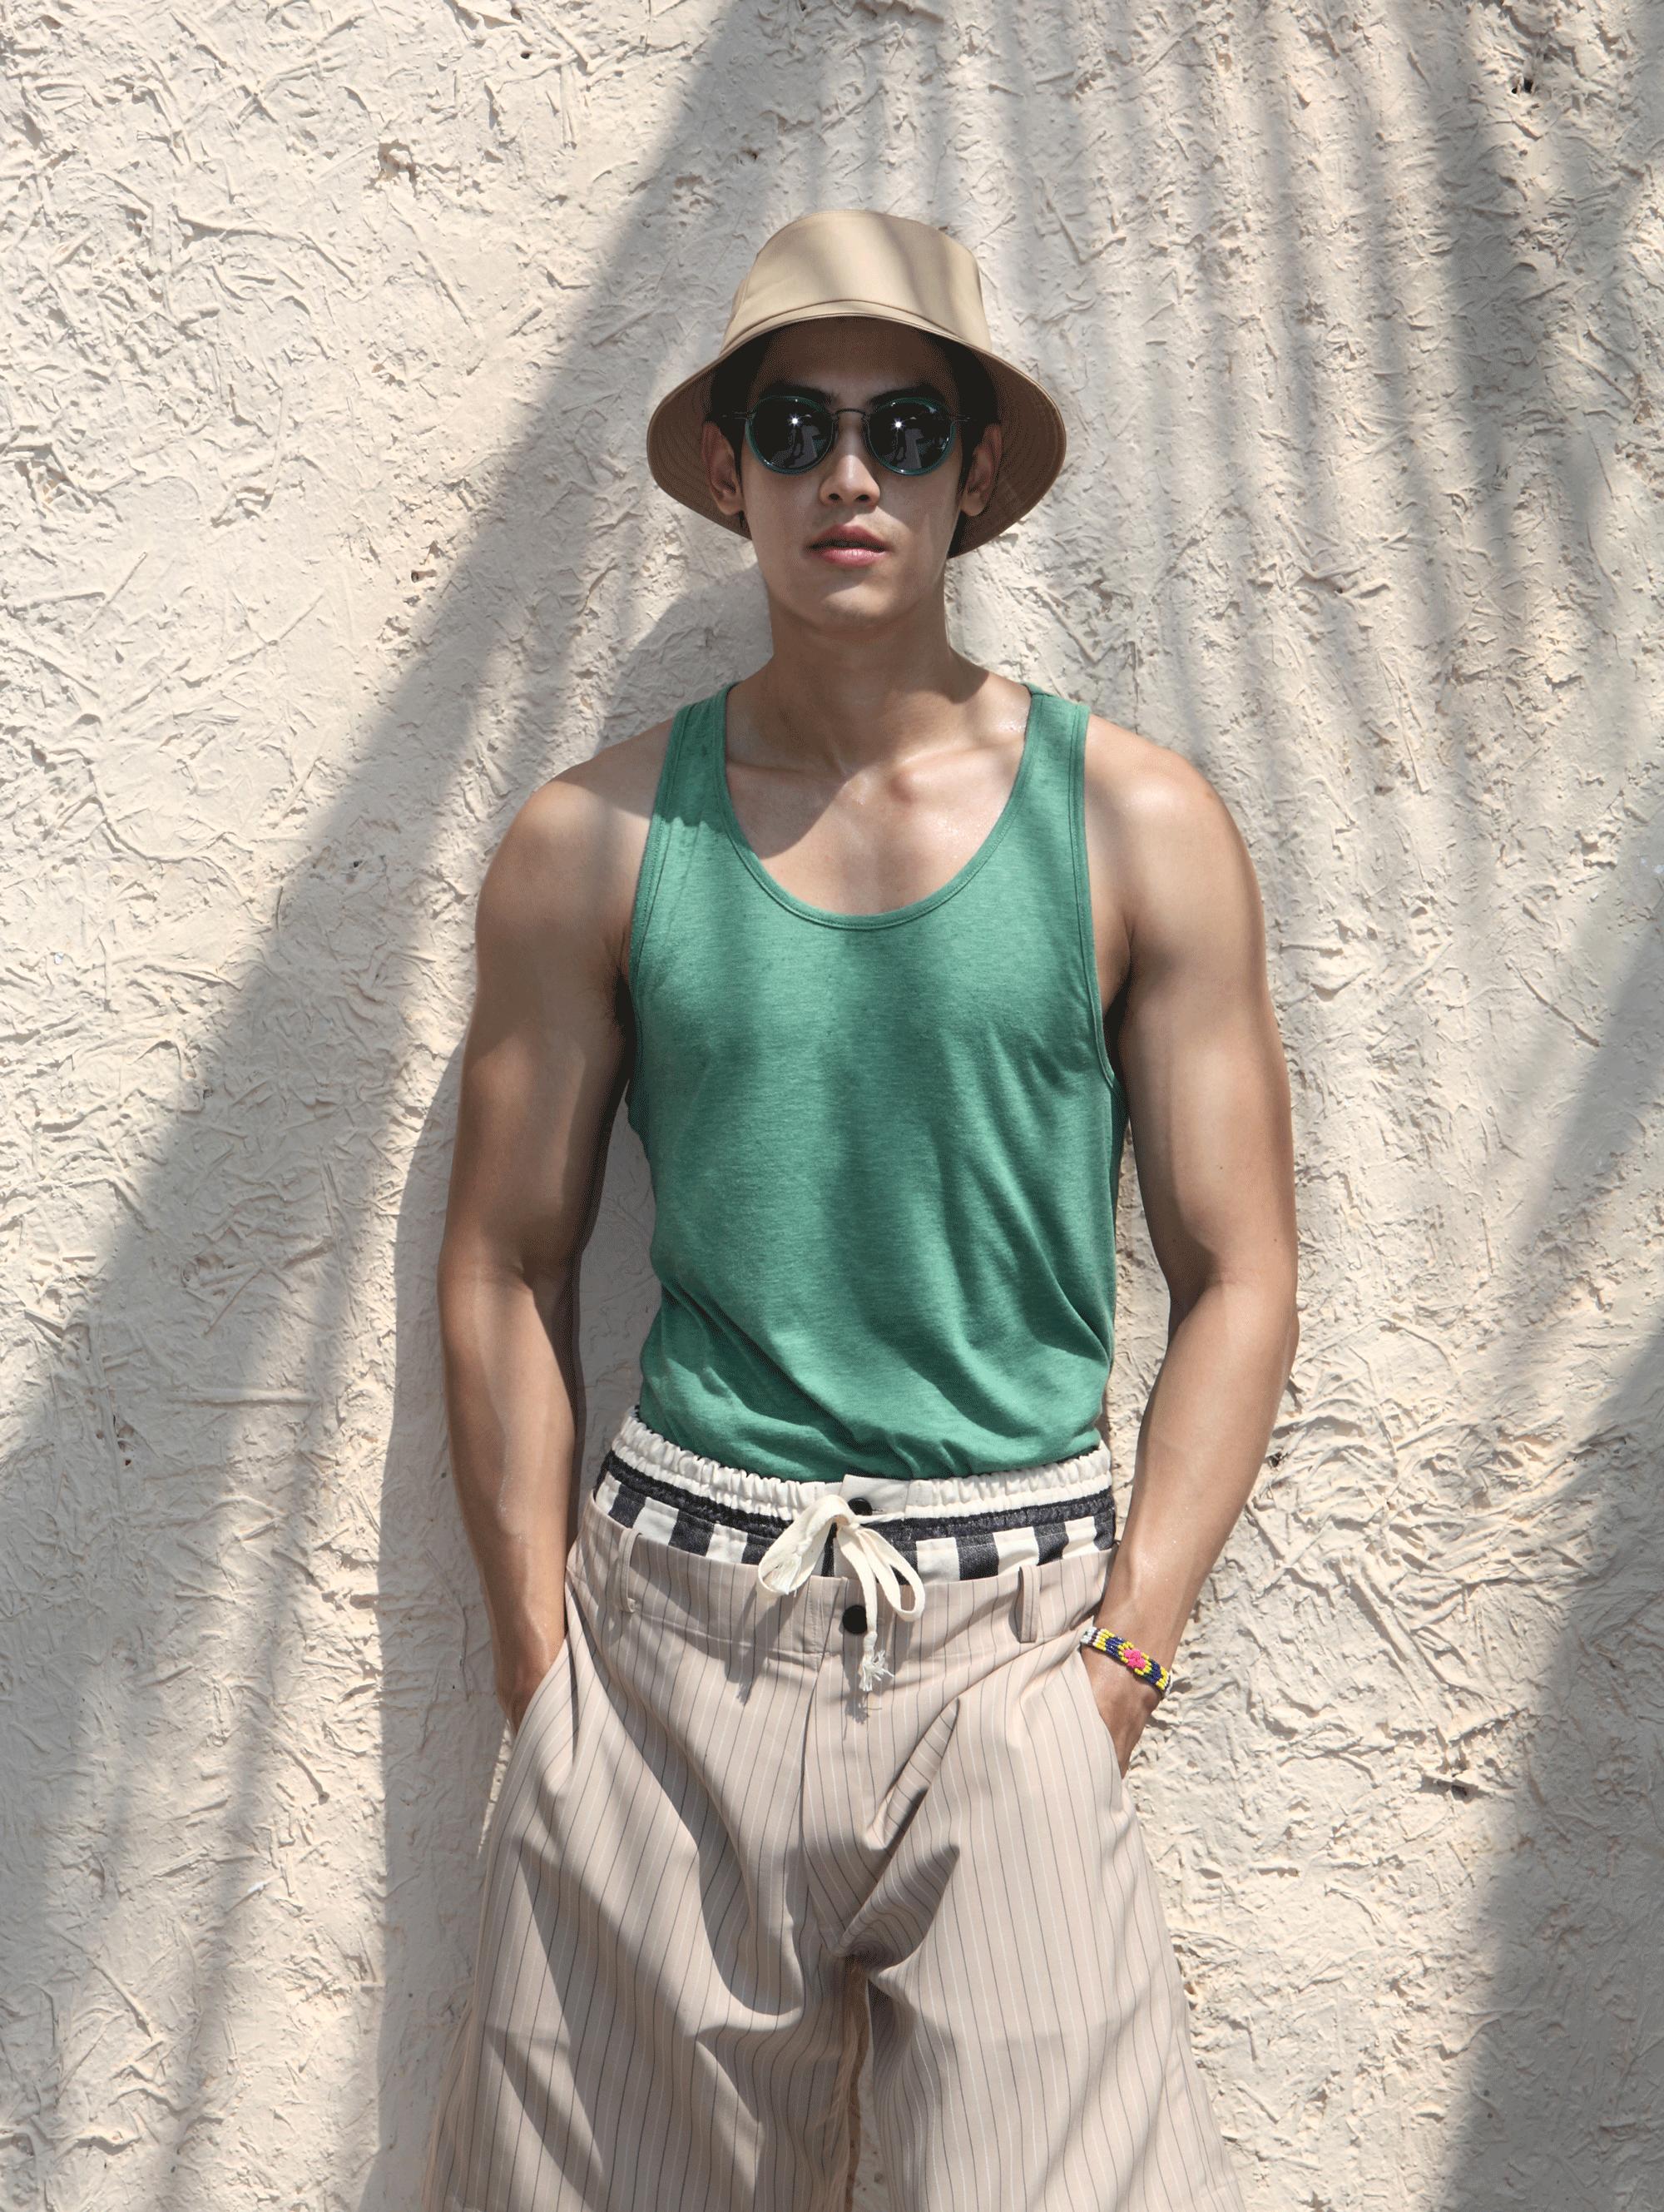 pants : Leisure Projects / sunglasses : TAVAT